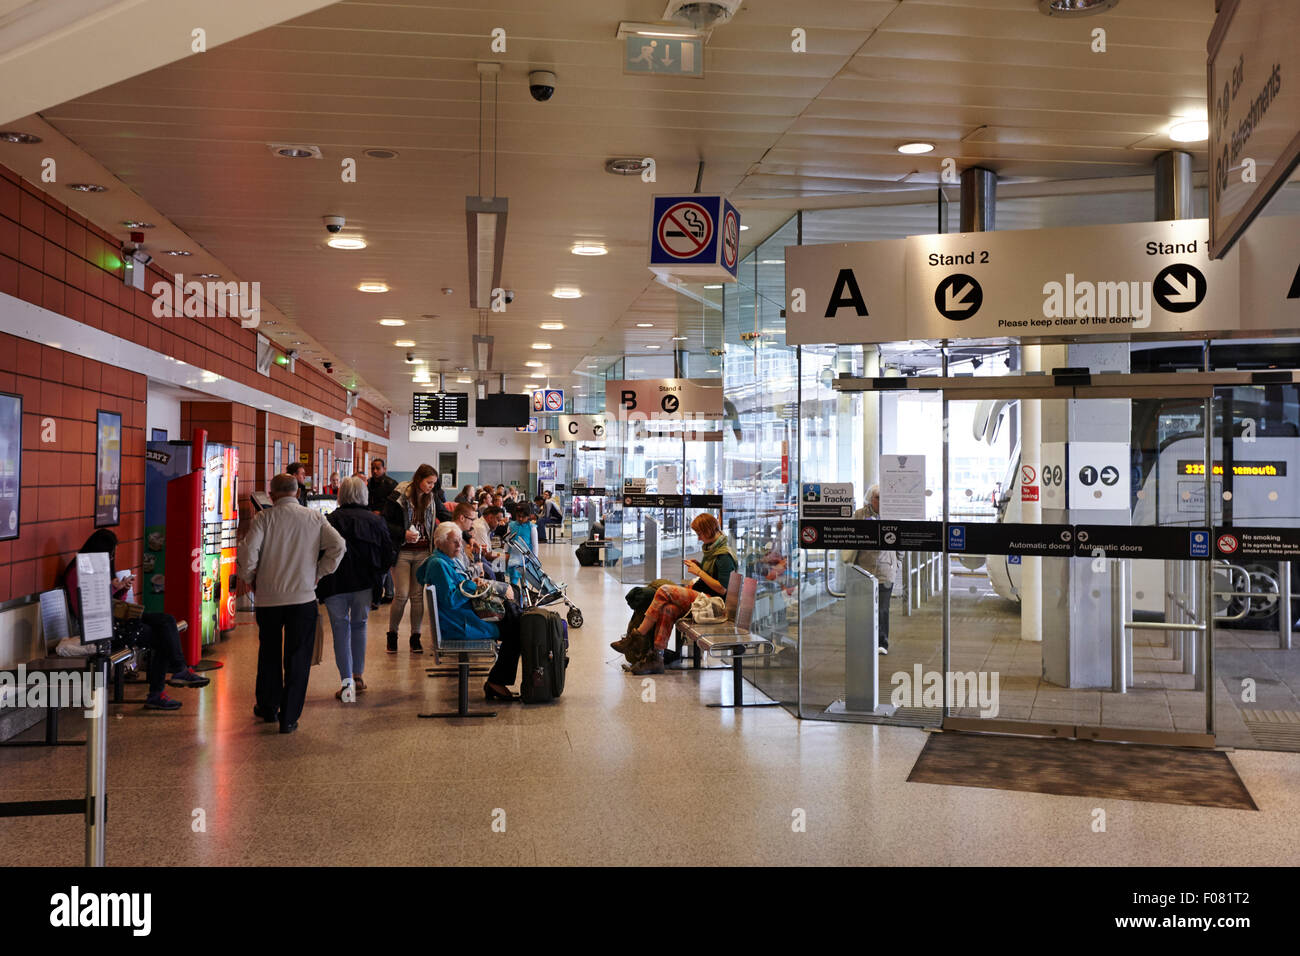 Manchester Coach Station Interior Uk Stock Photo 86228914 Alamy